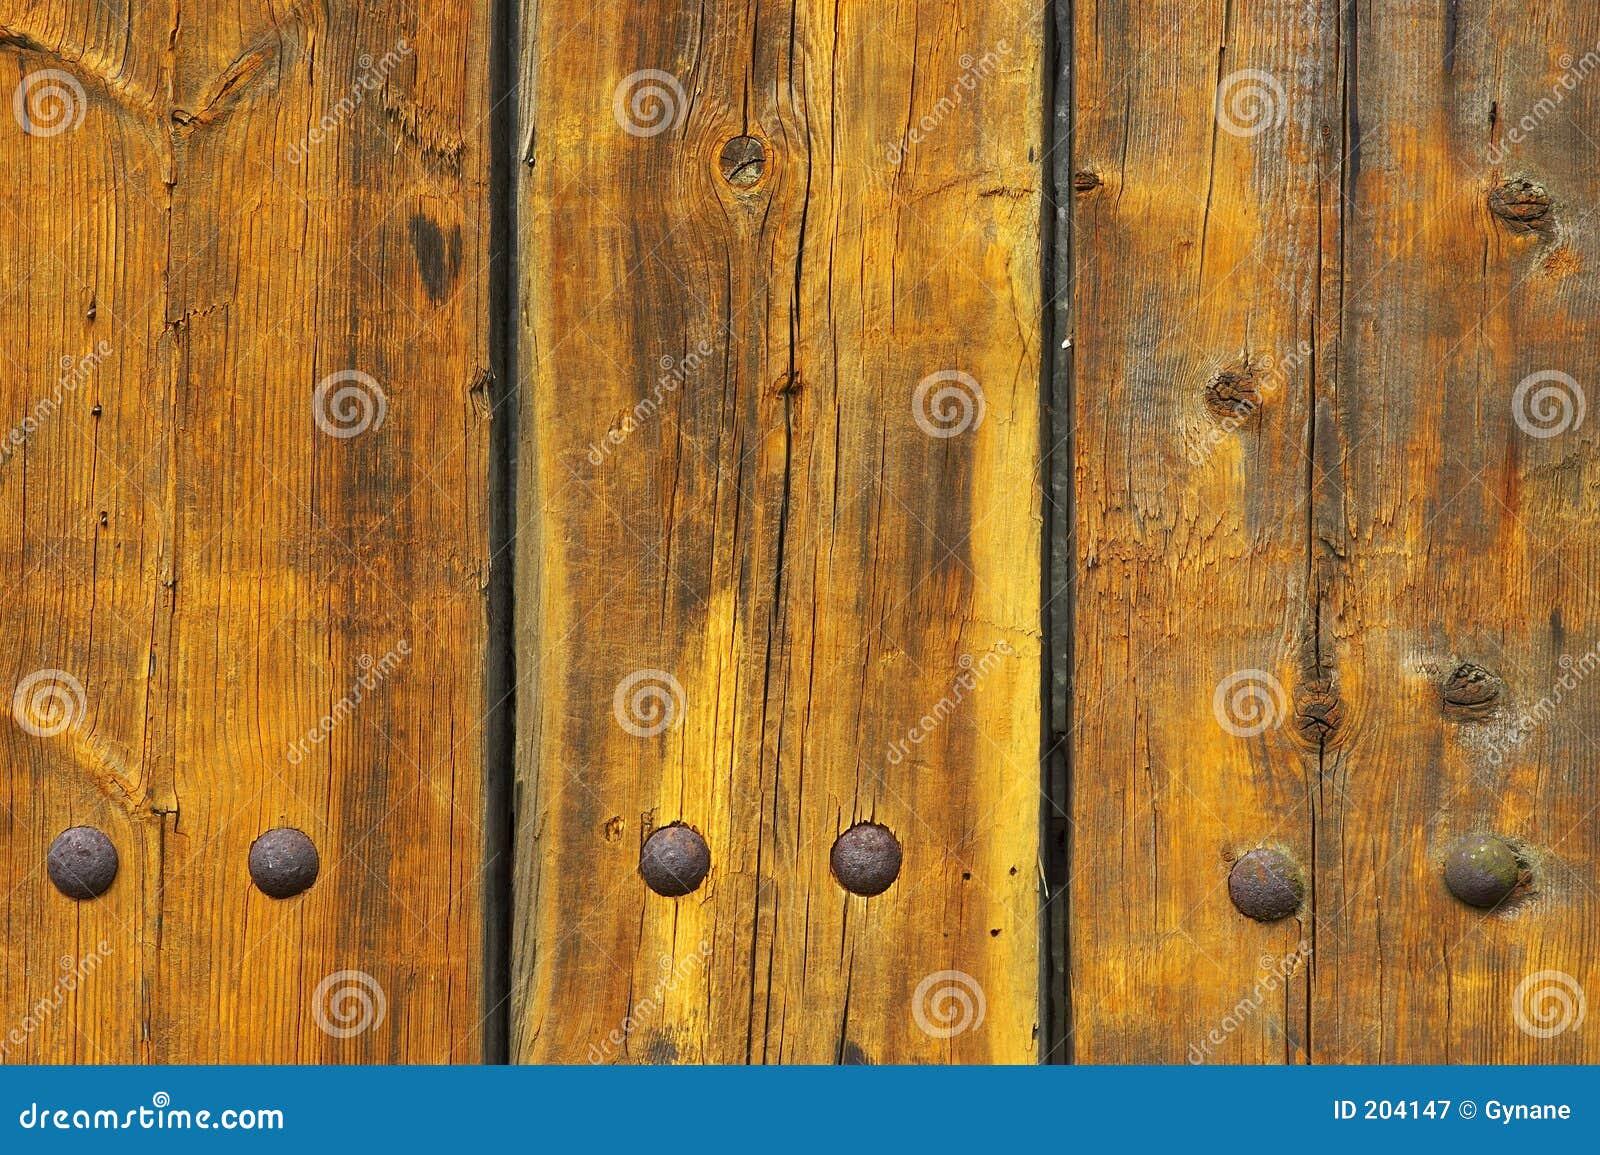 Tablones de madera fotograf a de archivo libre de regal as - Tablones de madera baratos ...